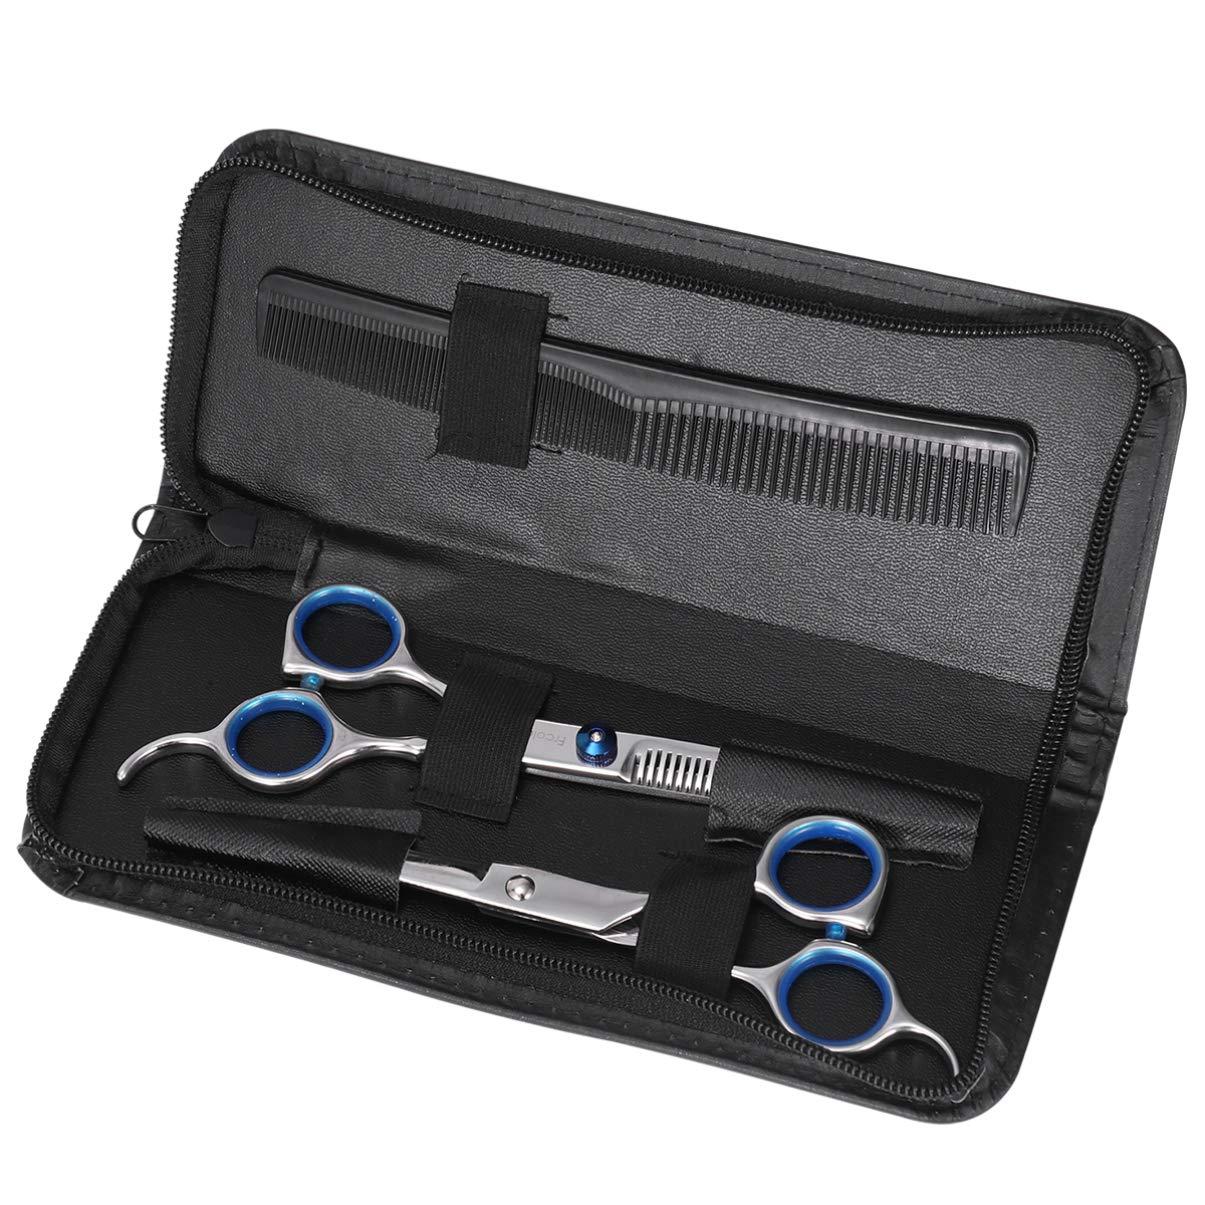 Hair Cutting Scissors Set, Professional Haircutting Scissors Barber Thinning Scissors Hairdressing Shears Set